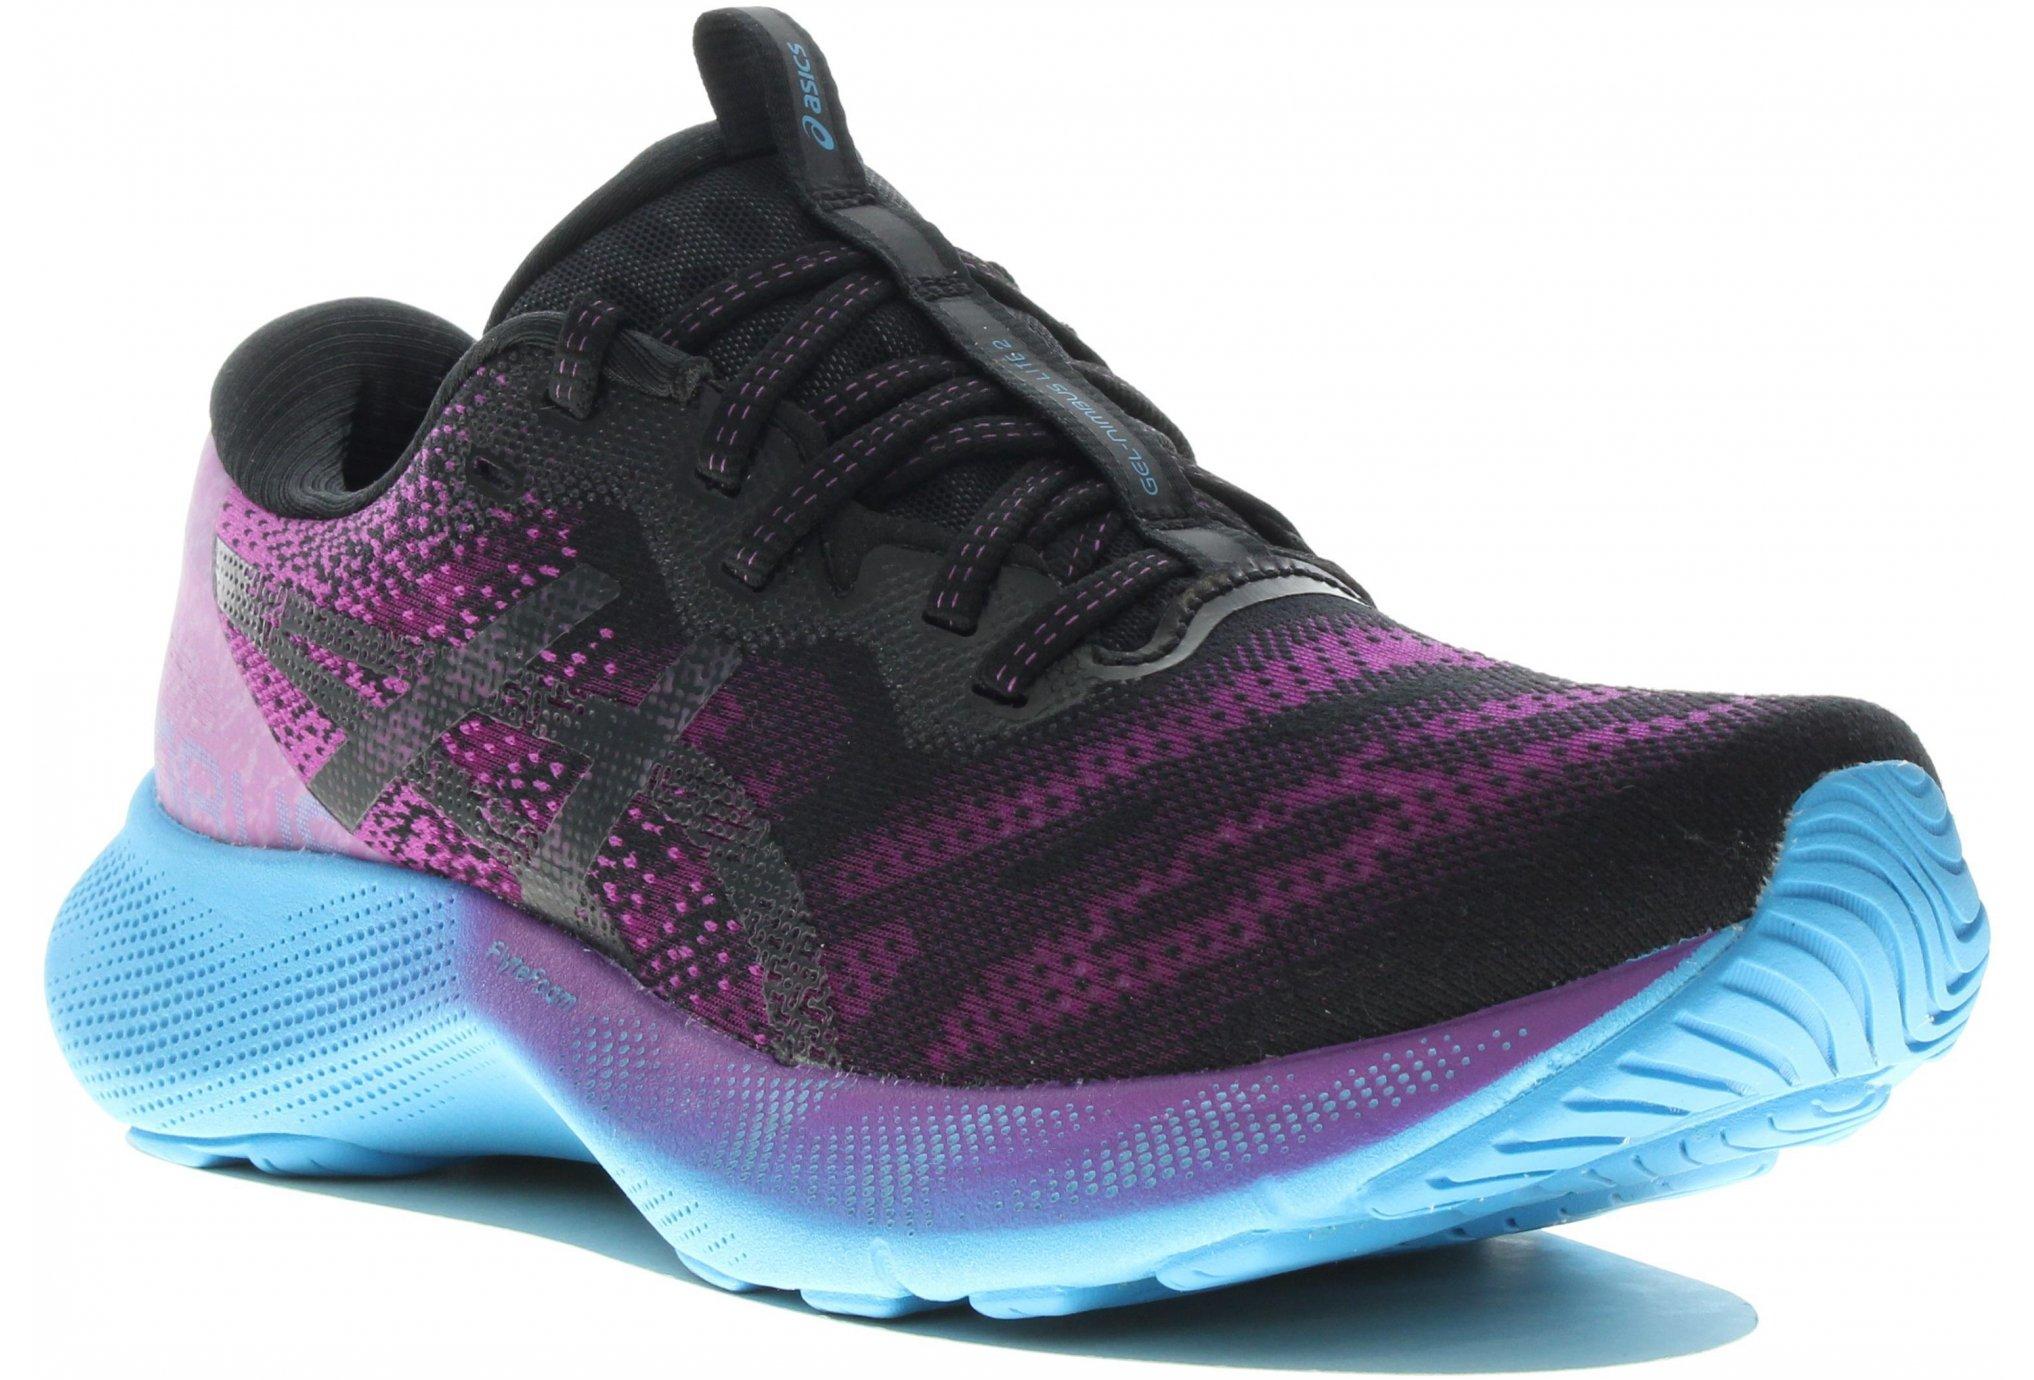 Asics Gel-Nimbus Lite 2 Chaussures running femme